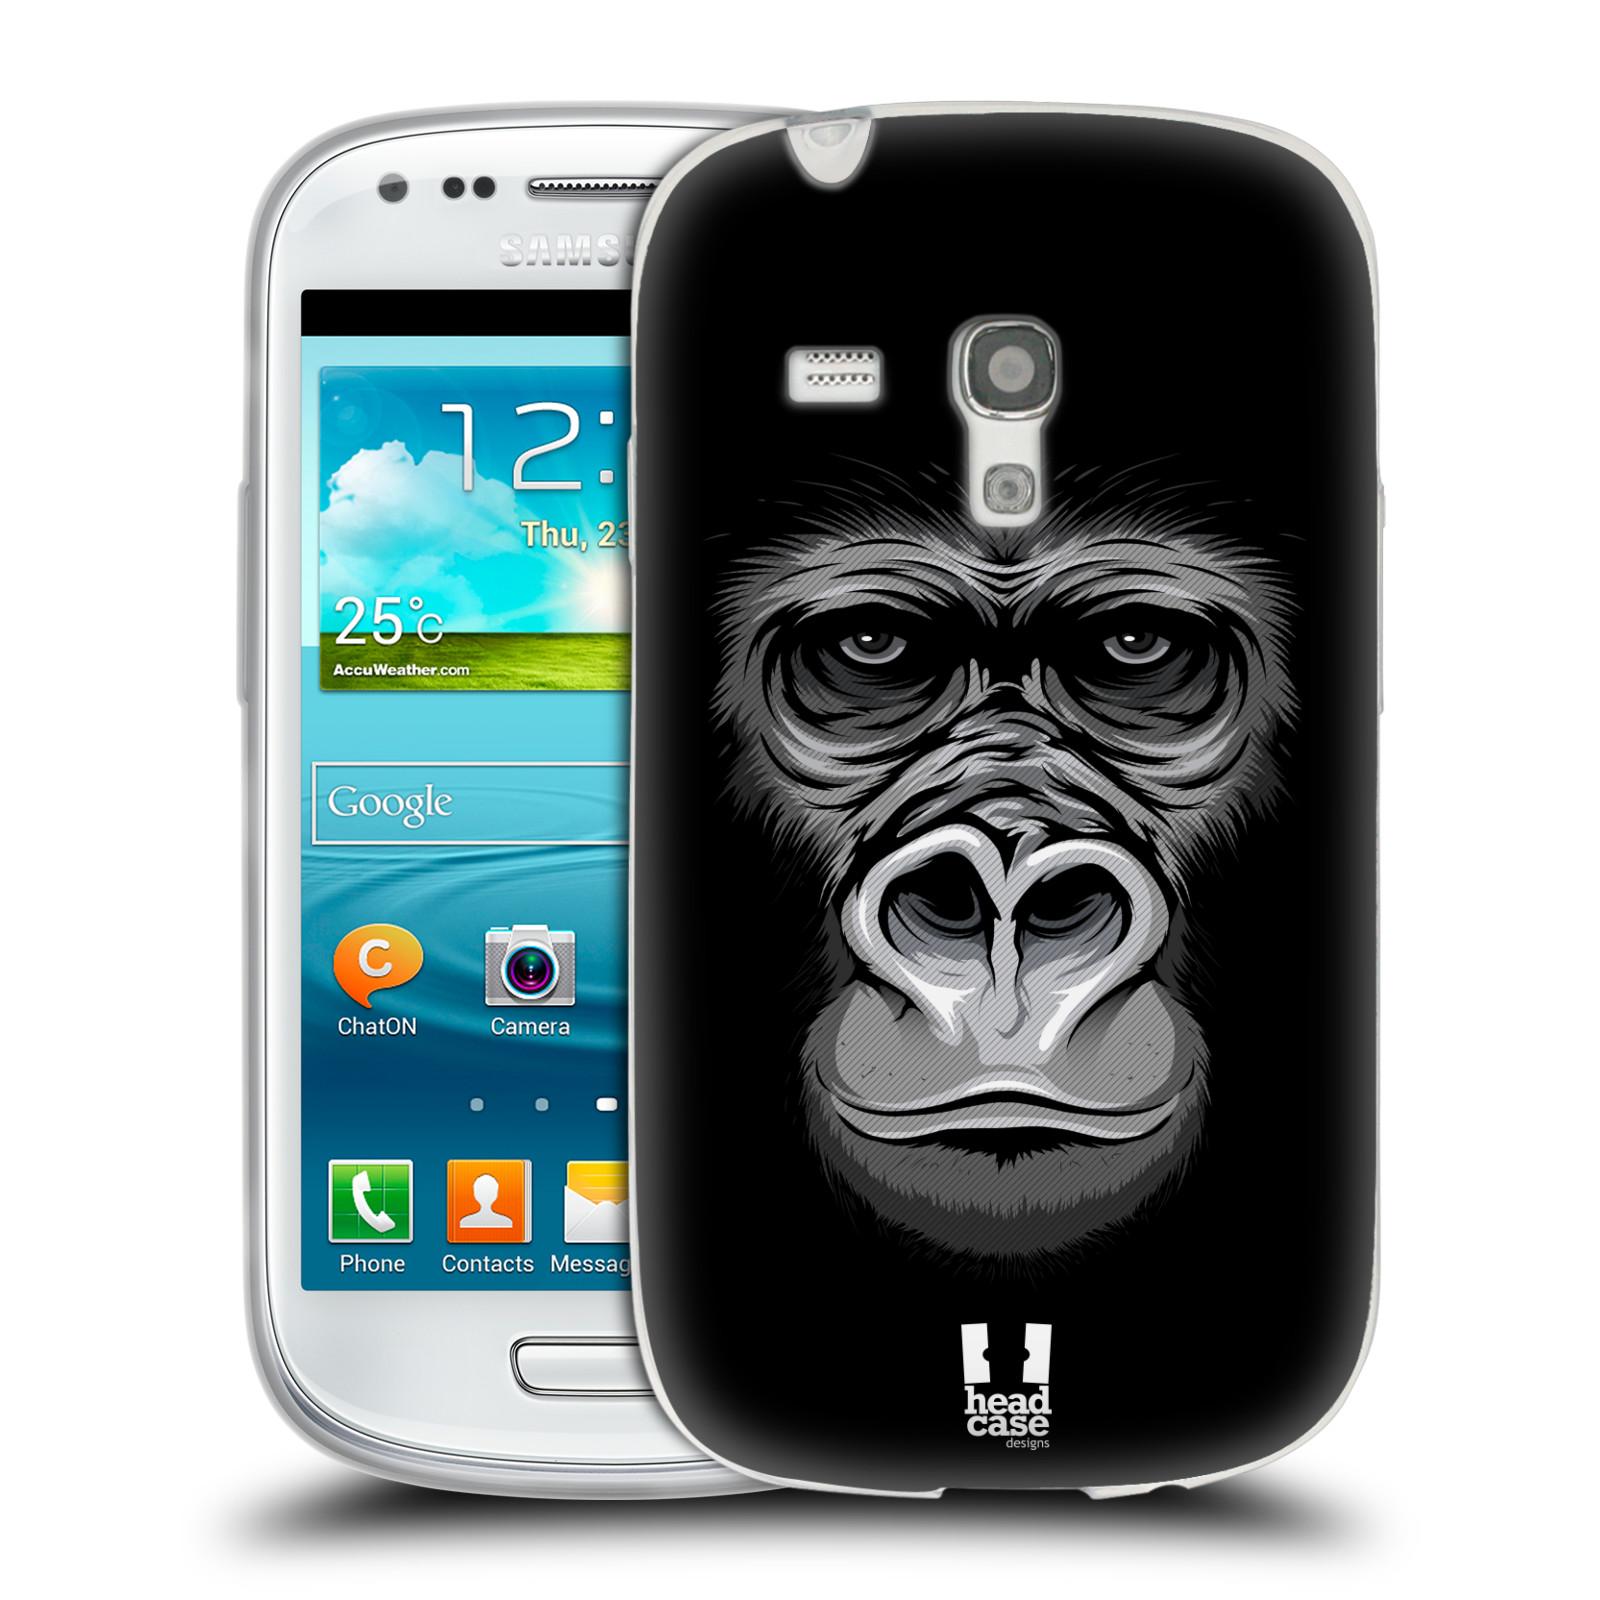 HEAD CASE silikonový obal na mobil Samsung Galaxy S3 MINI i8190 vzor Zvíře kreslená tvář 2 gorila